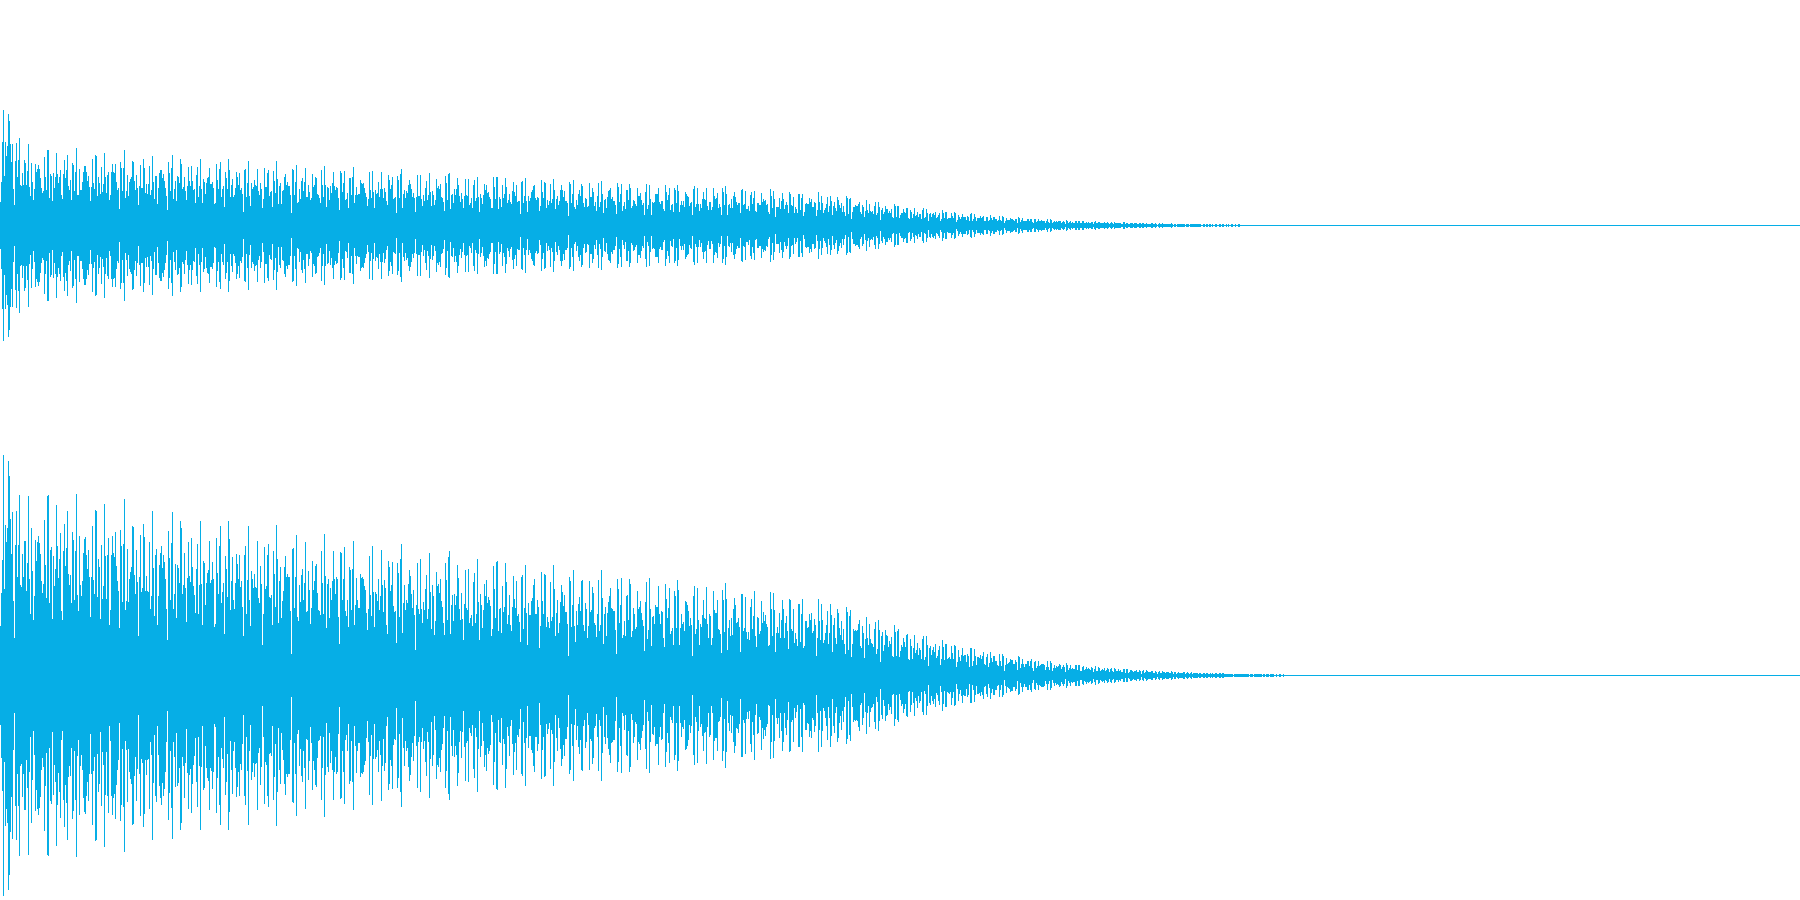 【SE 効果音】奇妙な音の再生済みの波形